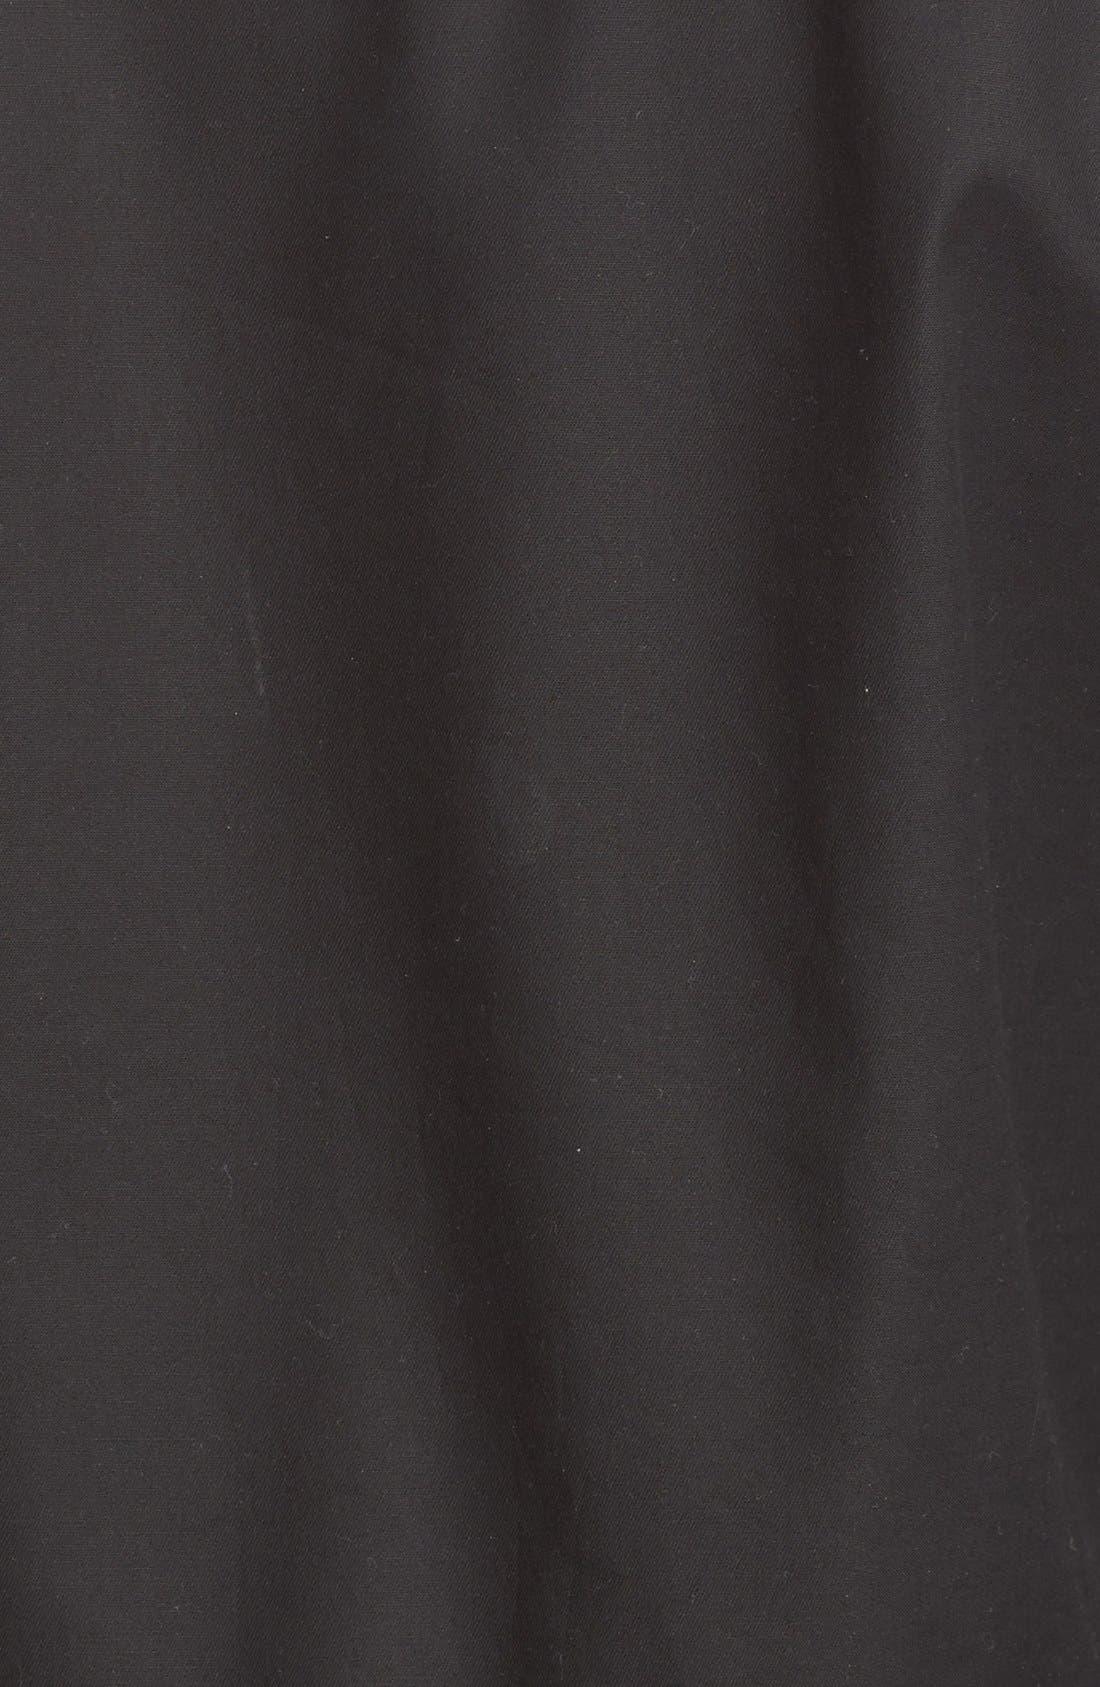 BELSTAFF,                             Trailmaster Staywax Jacket,                             Alternate thumbnail 7, color,                             001